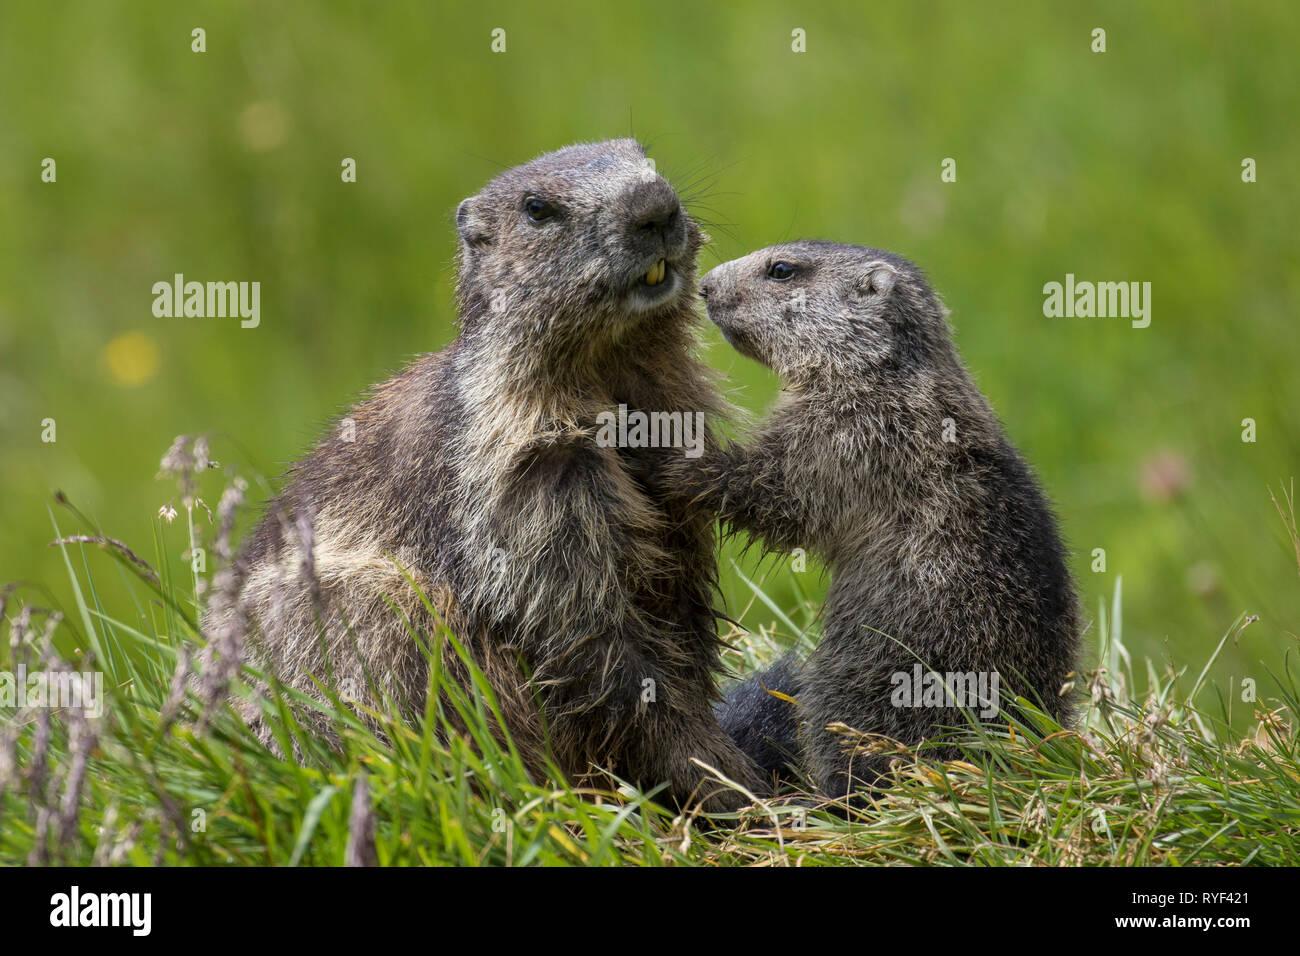 Alpine marmot (Marmota marmota) young greeting parent, Hohe Tauern National Park, Carinthia, Austria - Stock Image